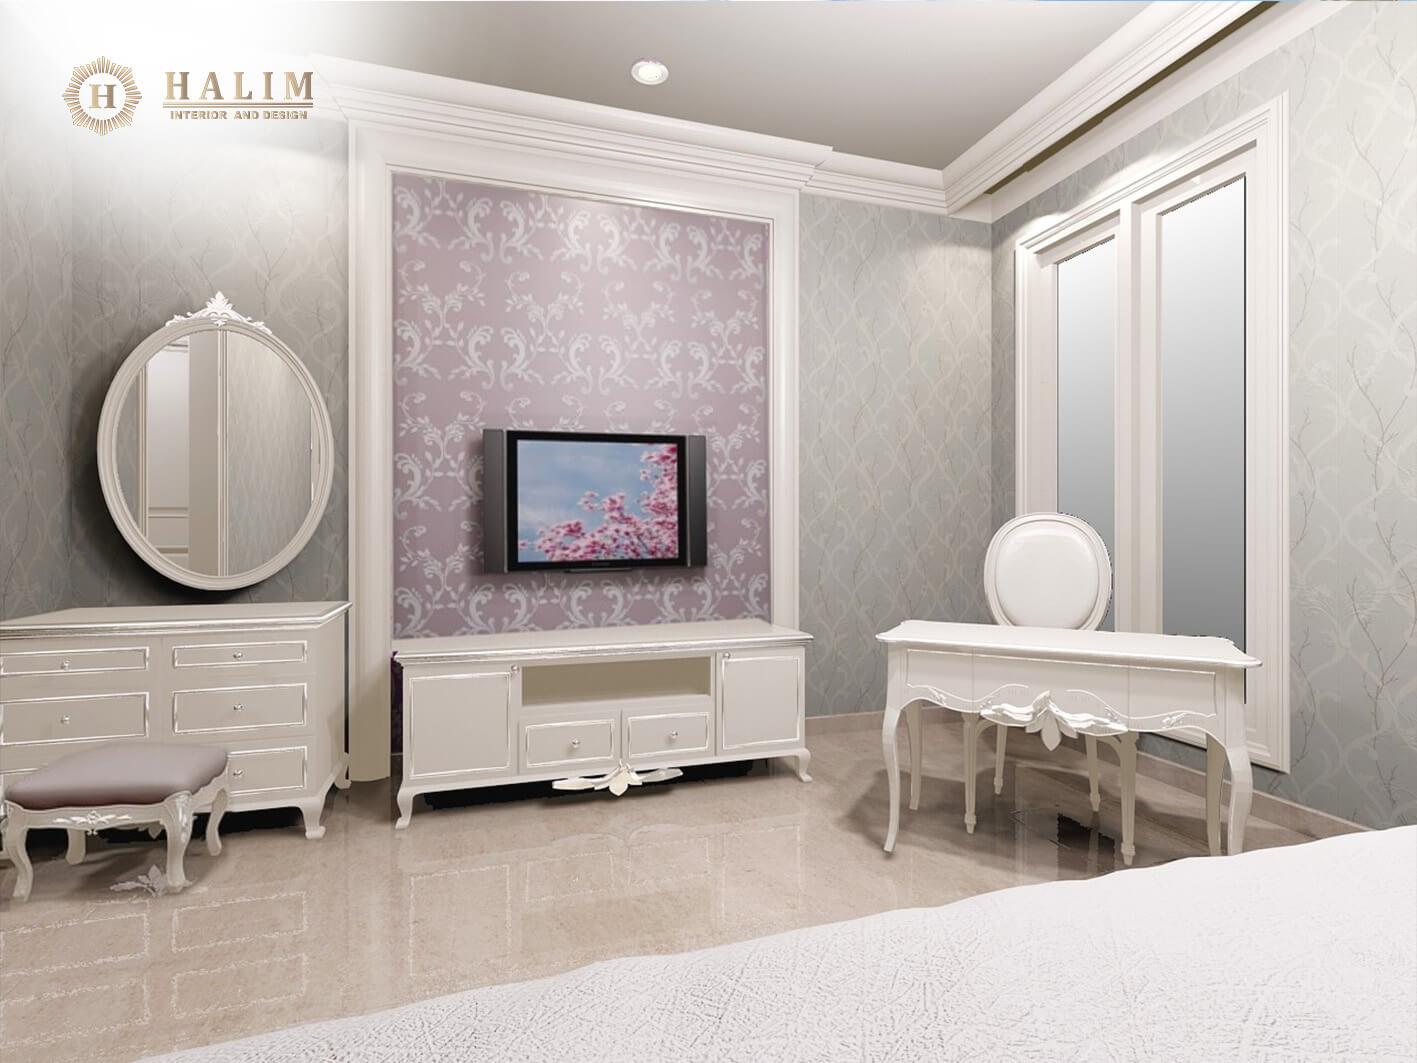 Halim, Interior, modern, furniture, contemporer american style, minimalist, european, classic, surabaya, 2 Pakuwon City